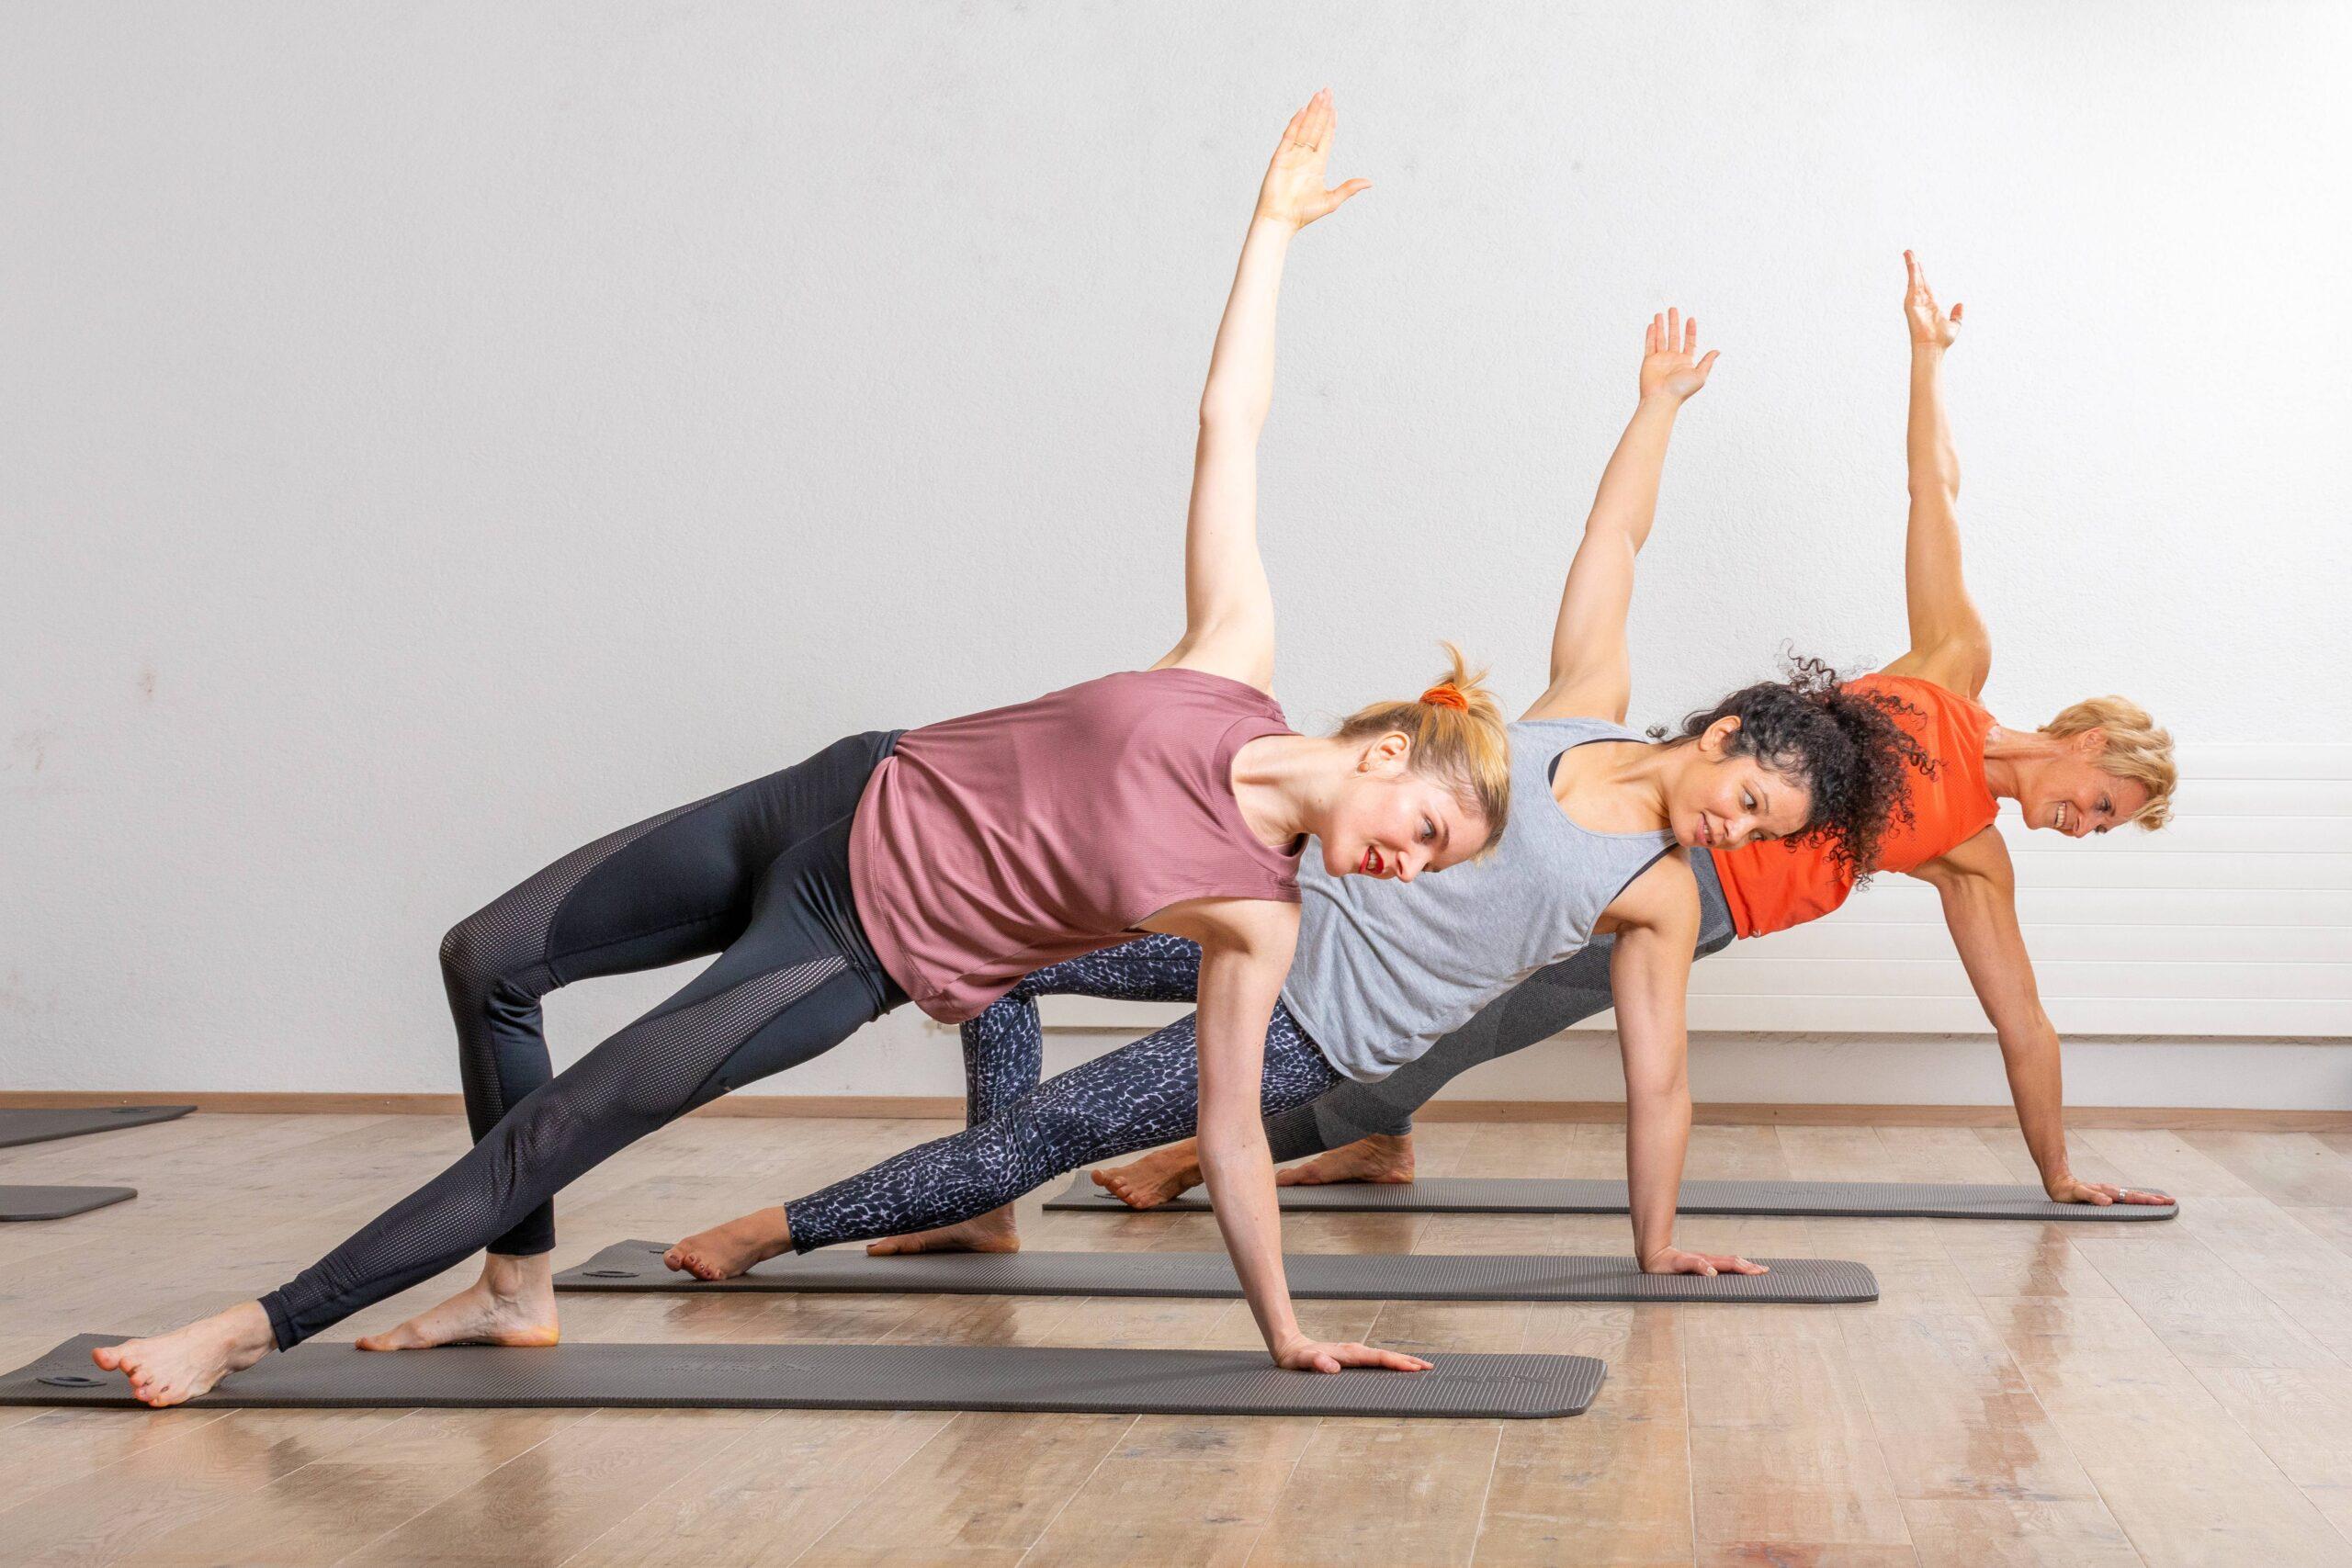 Groupfitness, Workout, Strech in Motion Vipfitstyle, Yvonne Bächli, Fitness Albisrieden